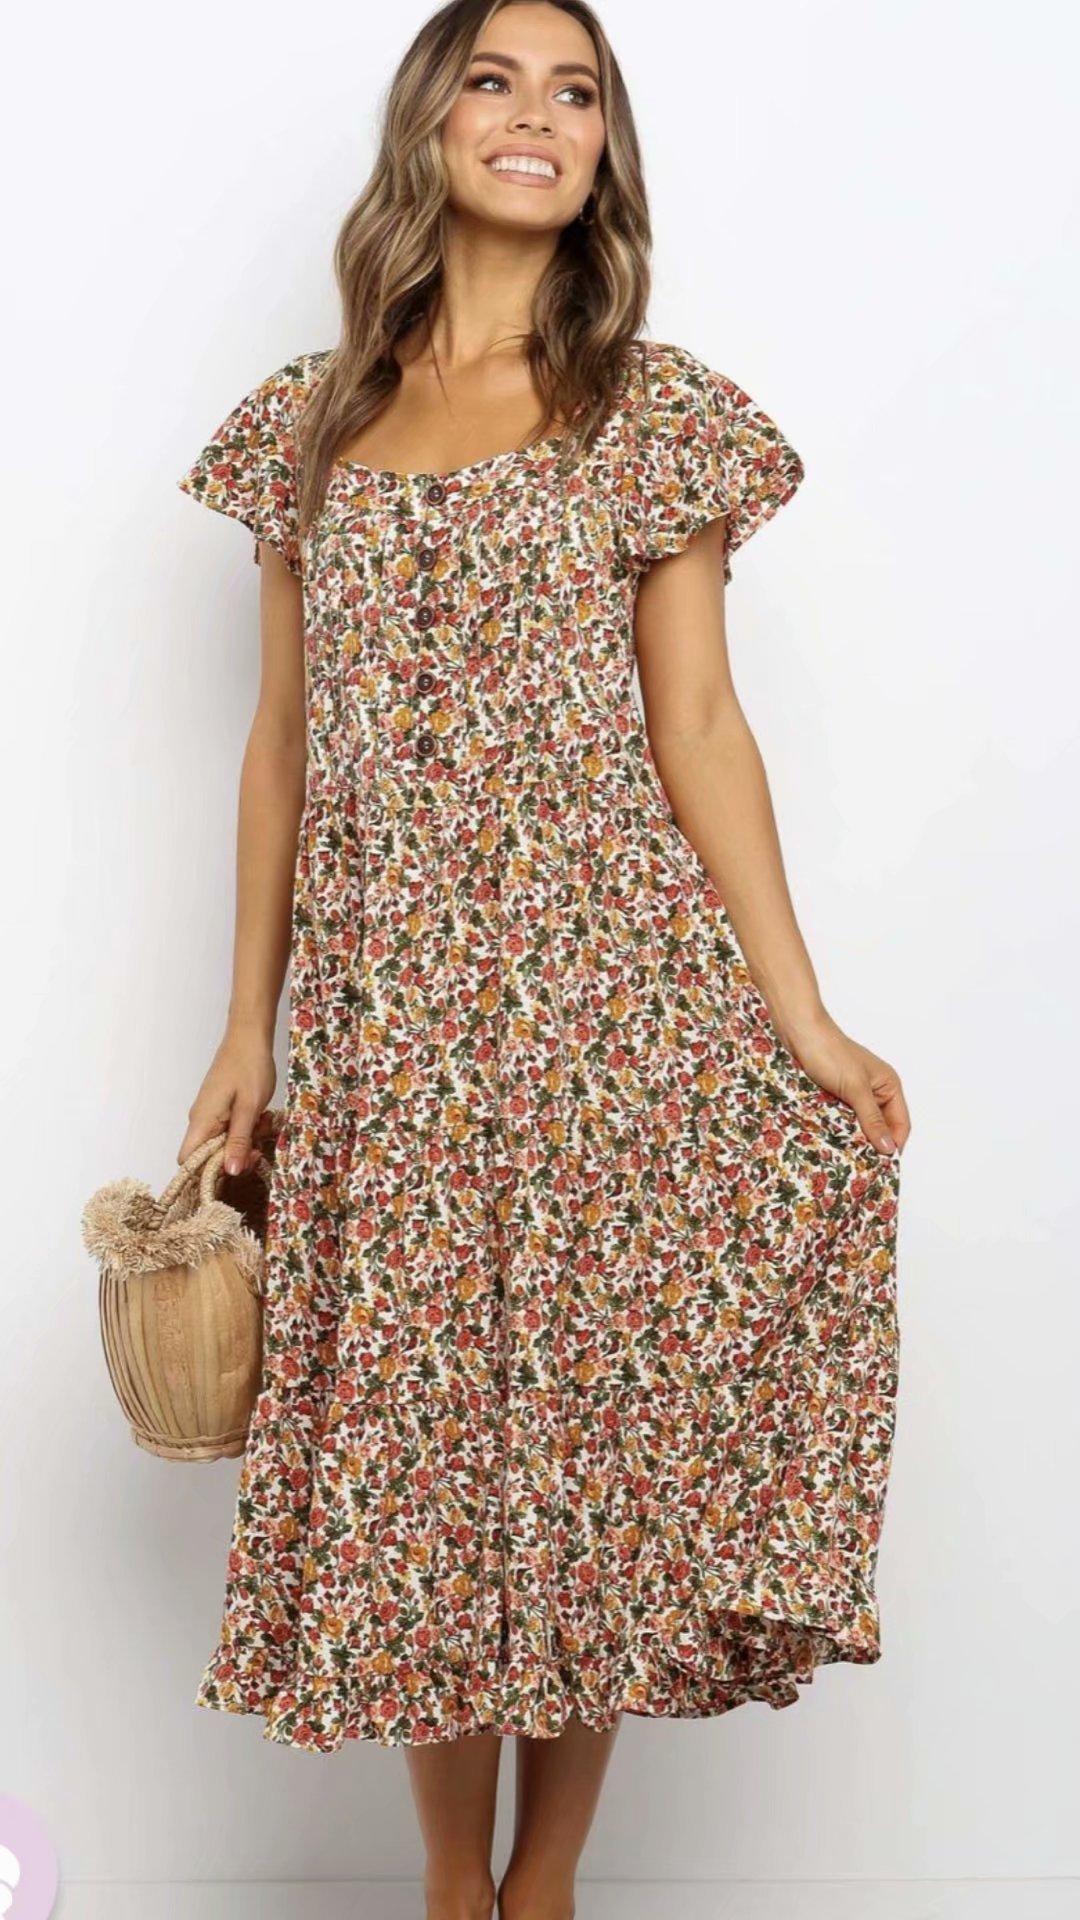 2020 new Spring Summer European Floral Printed female Dress zaraing vadiming sheining Women dress streetwear S493